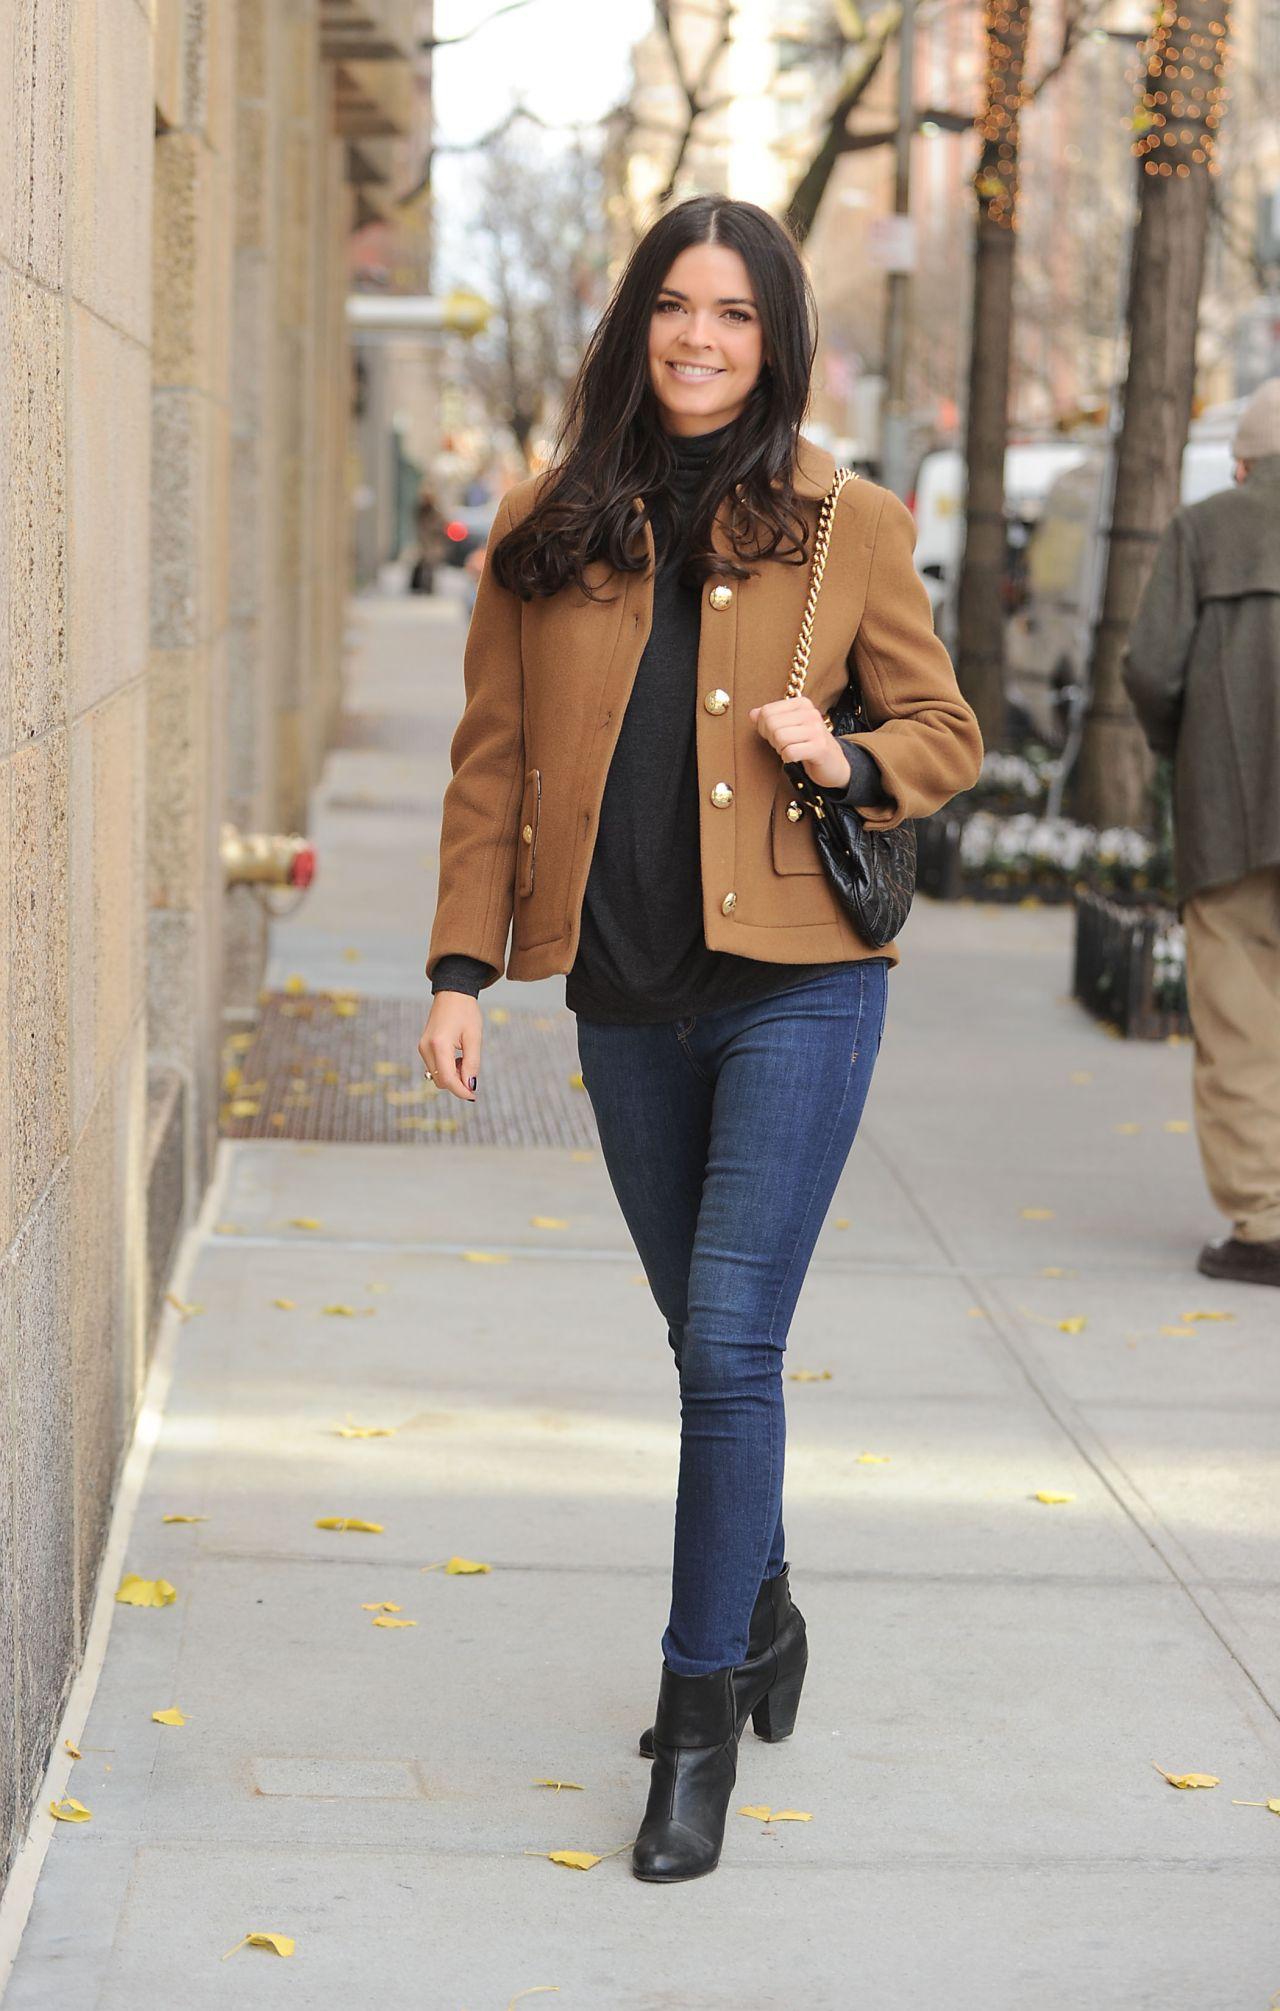 Katie Lee Casual Style Leaving Nbc Studios In New York